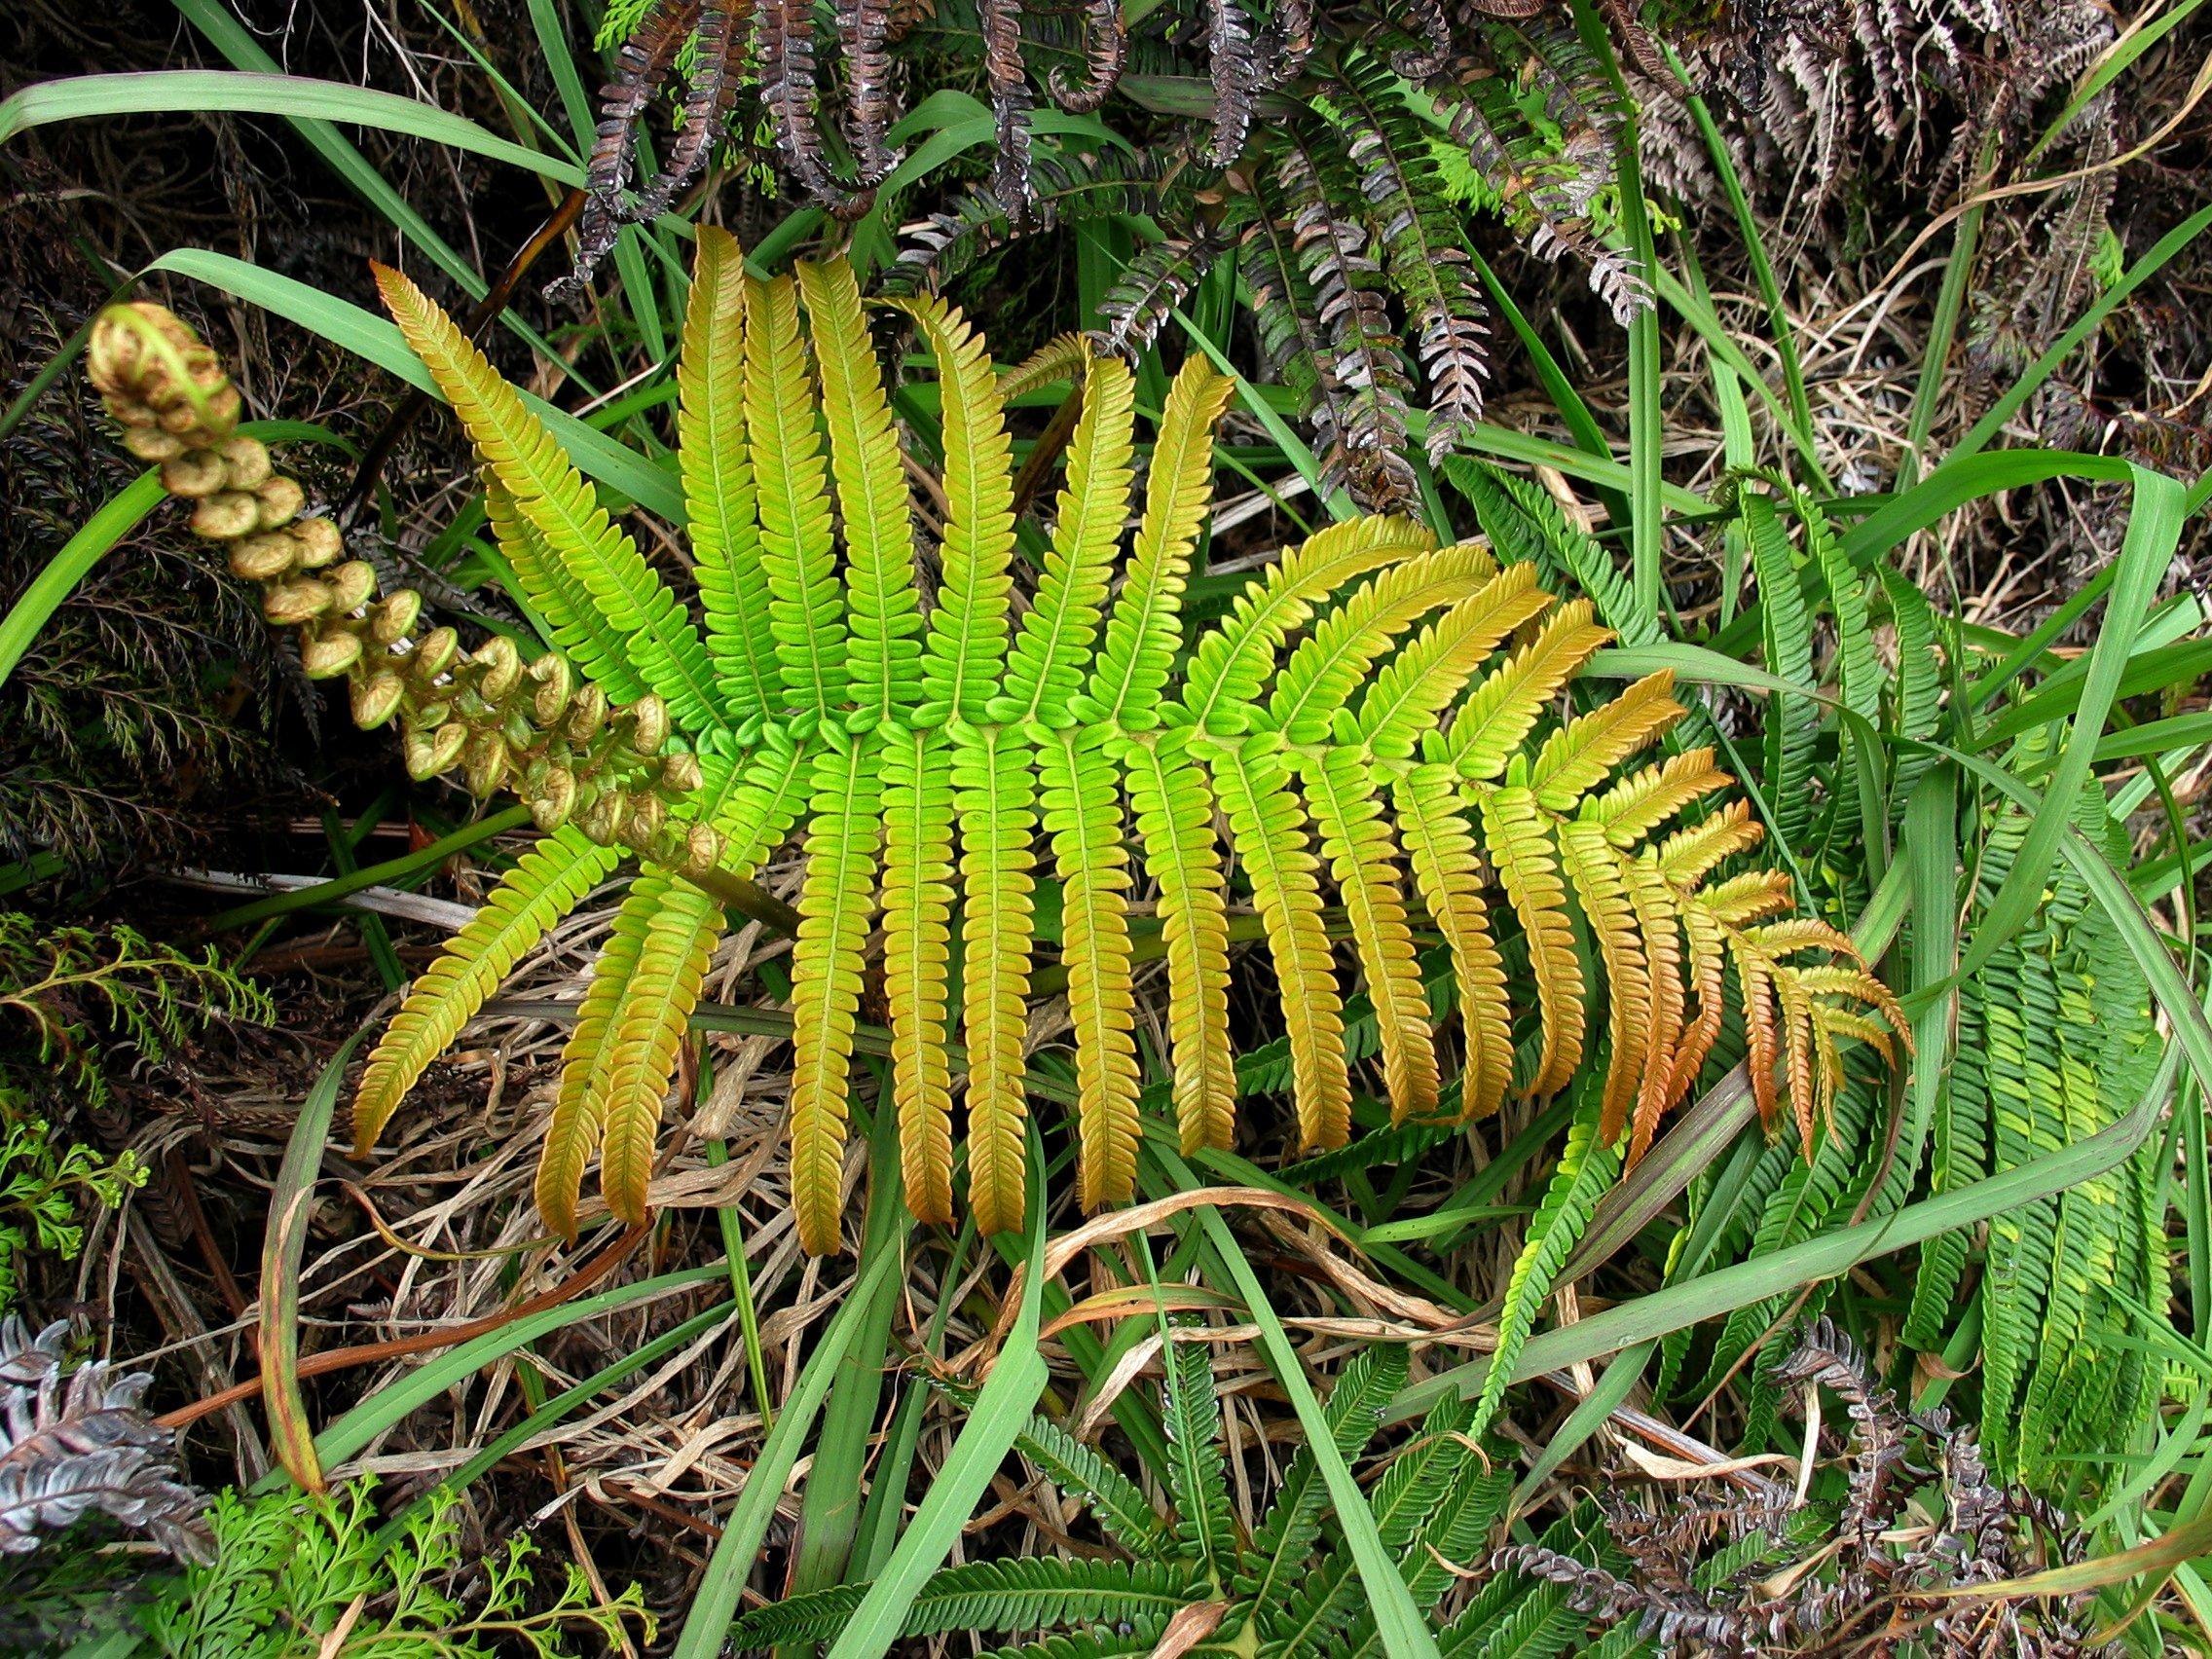 Image of amaumau fern